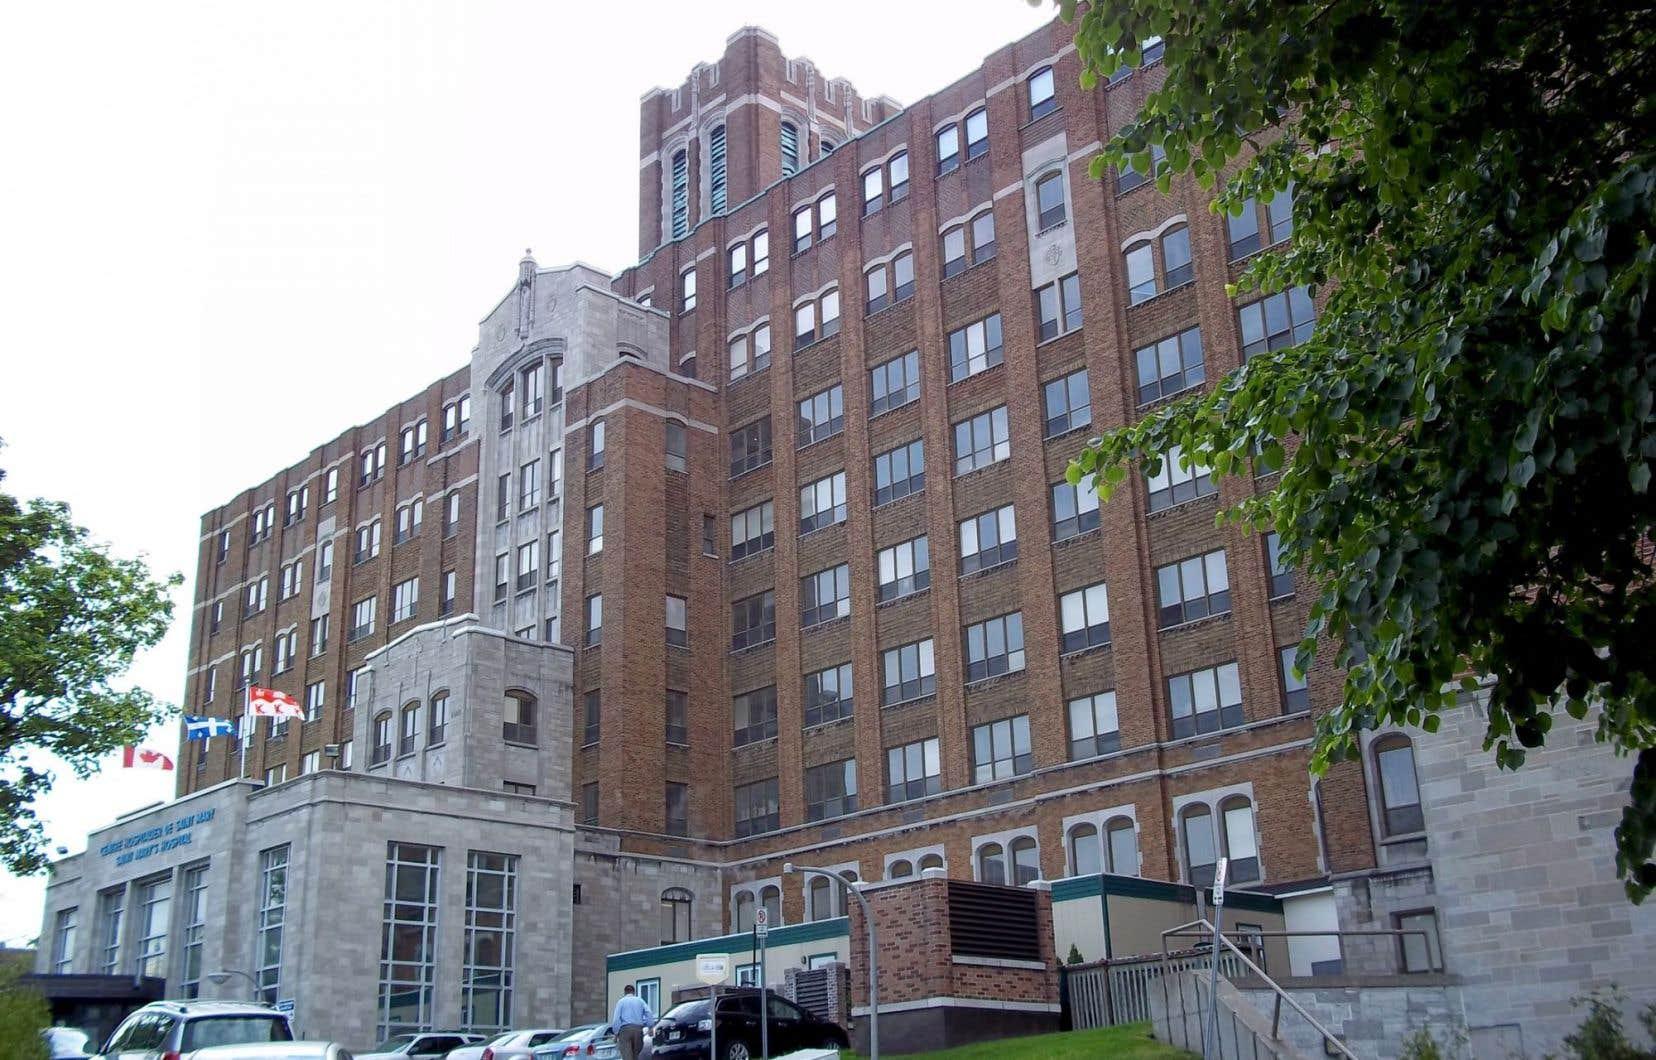 L'hôpital St. Mary